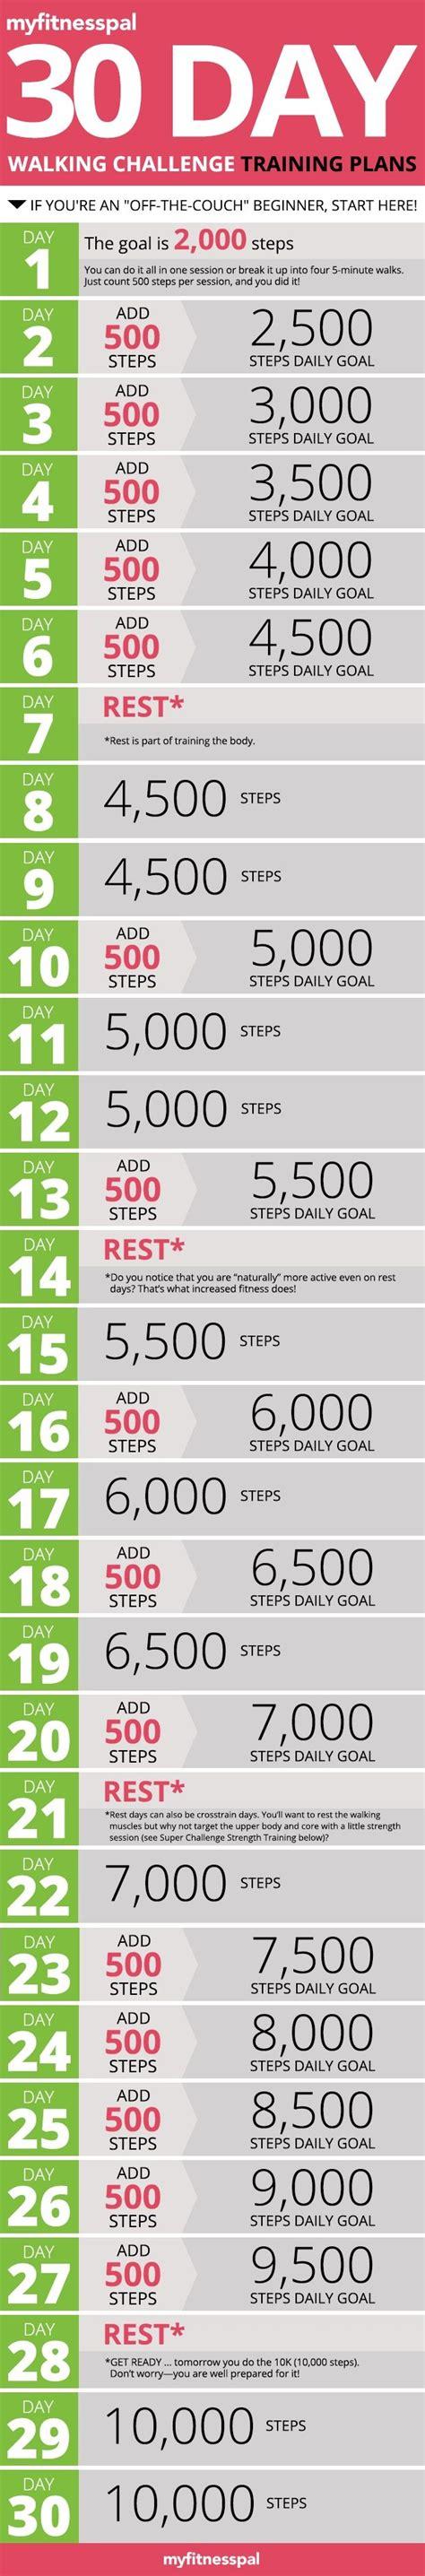 walking challenge the 30 day walking challenge myfitnesspal